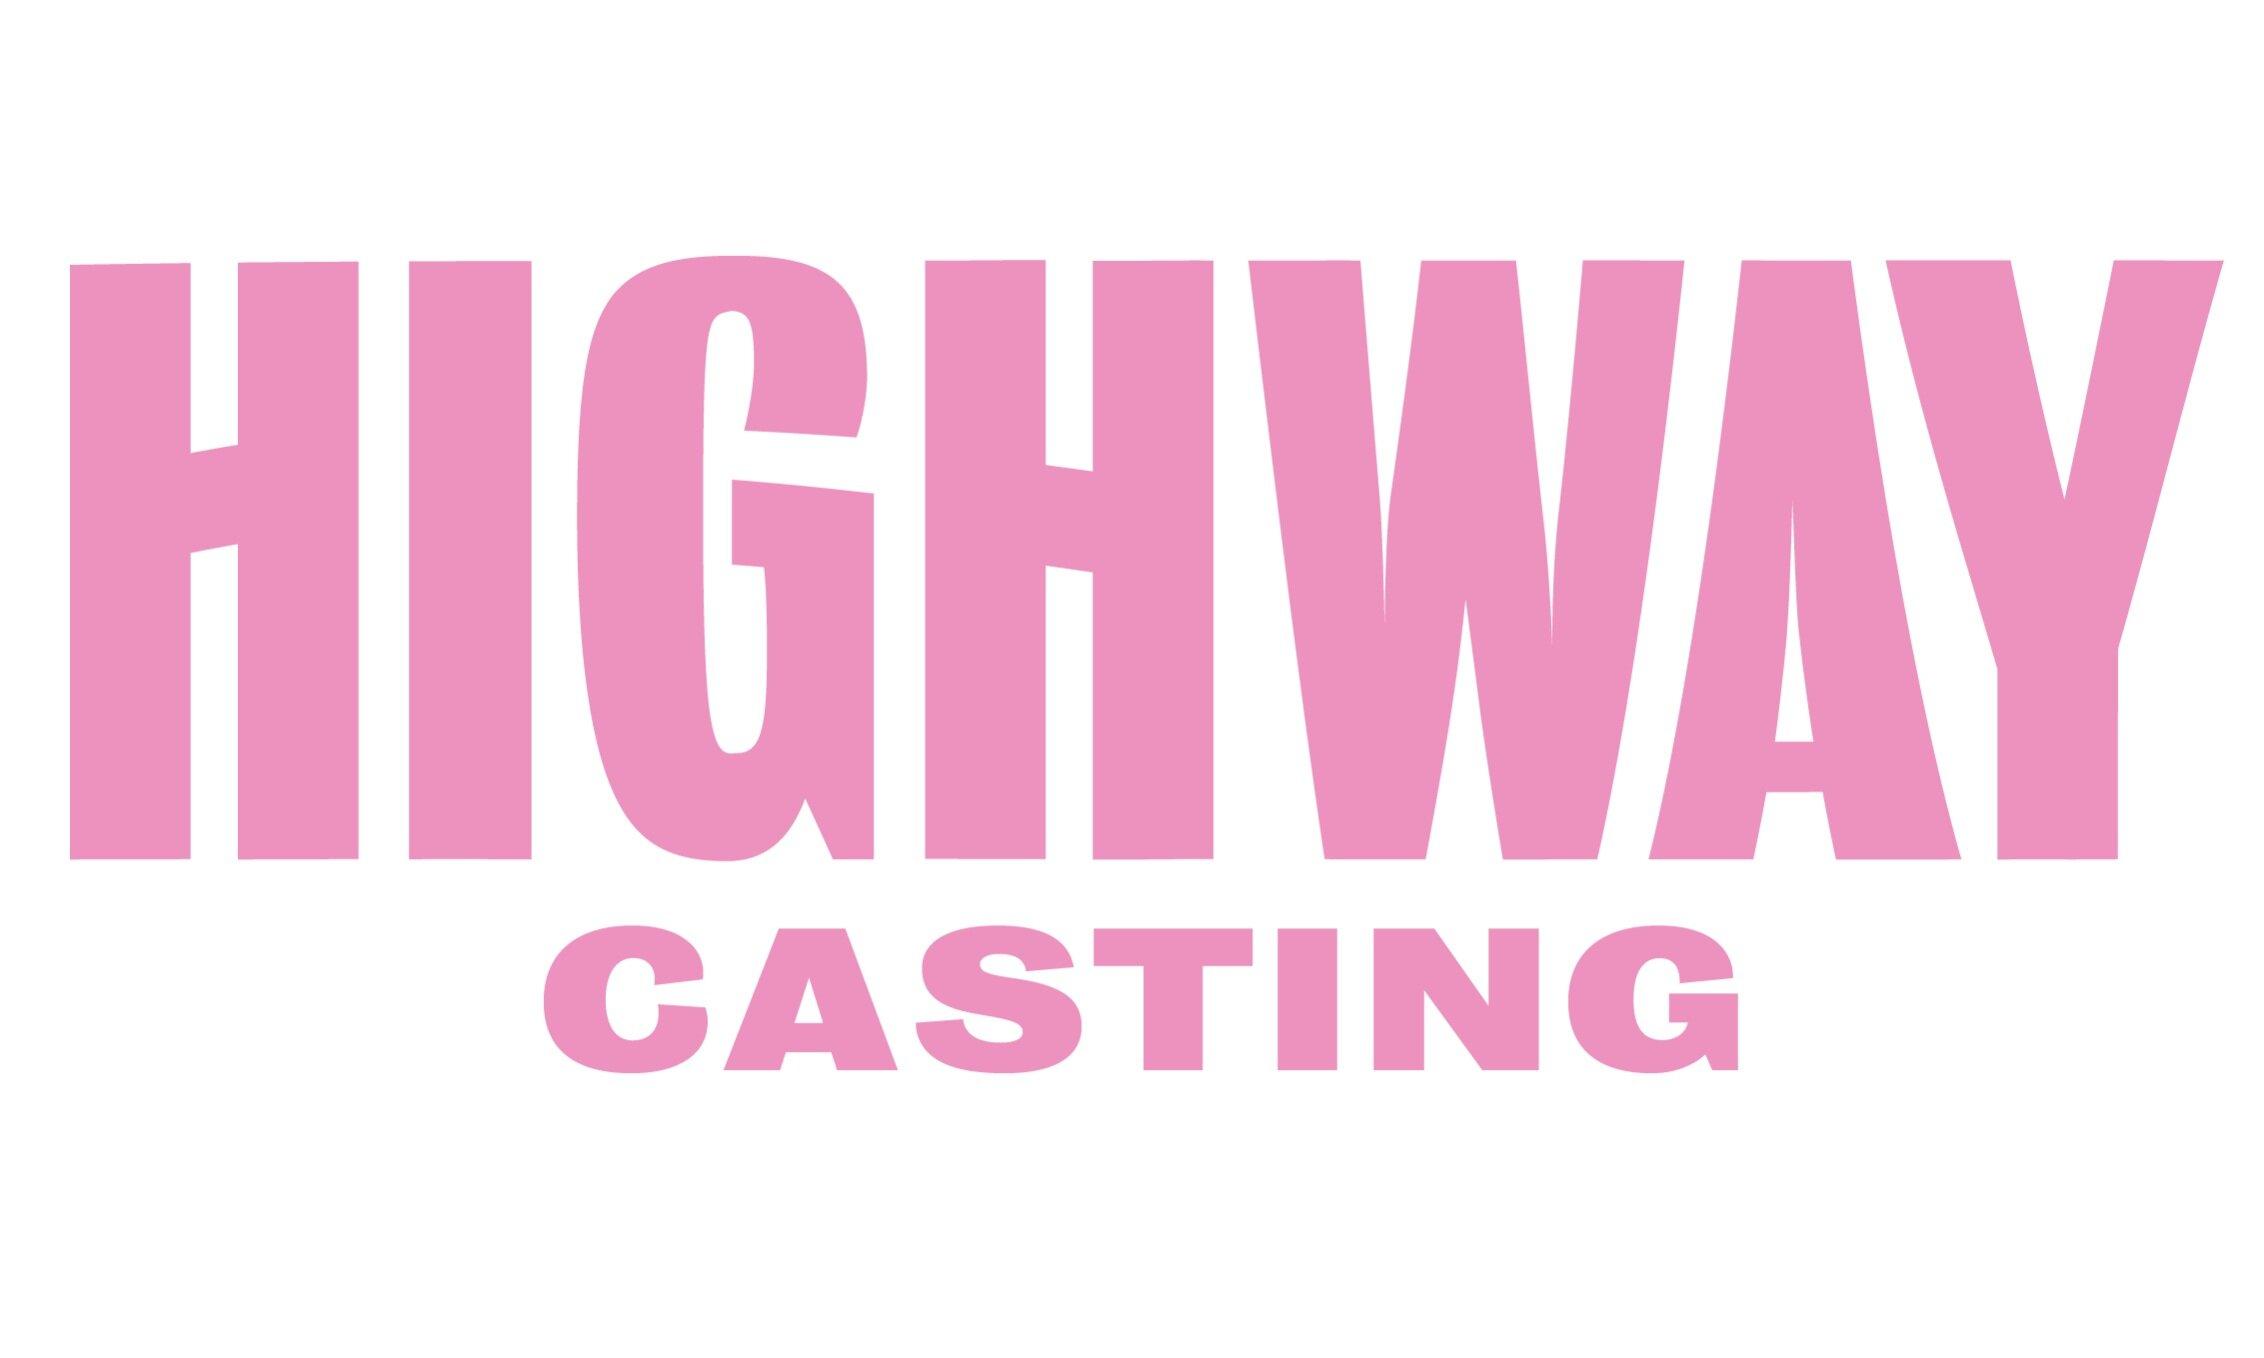 highway_casting_logo.jpg